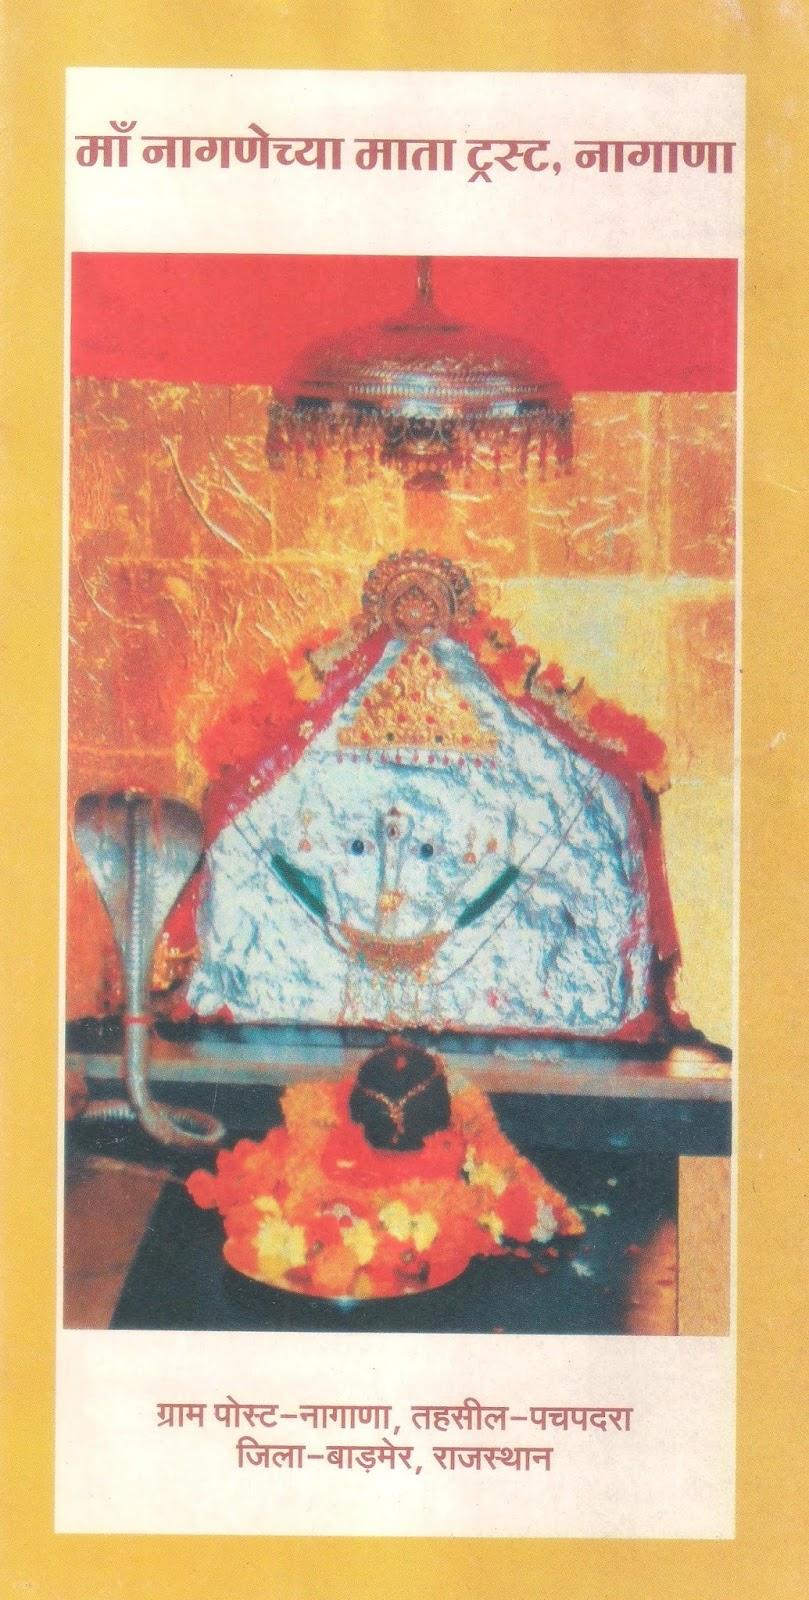 Nagnechiya Maa - Kuldevi of Rathore, Rajput ~ Hindu Festivals